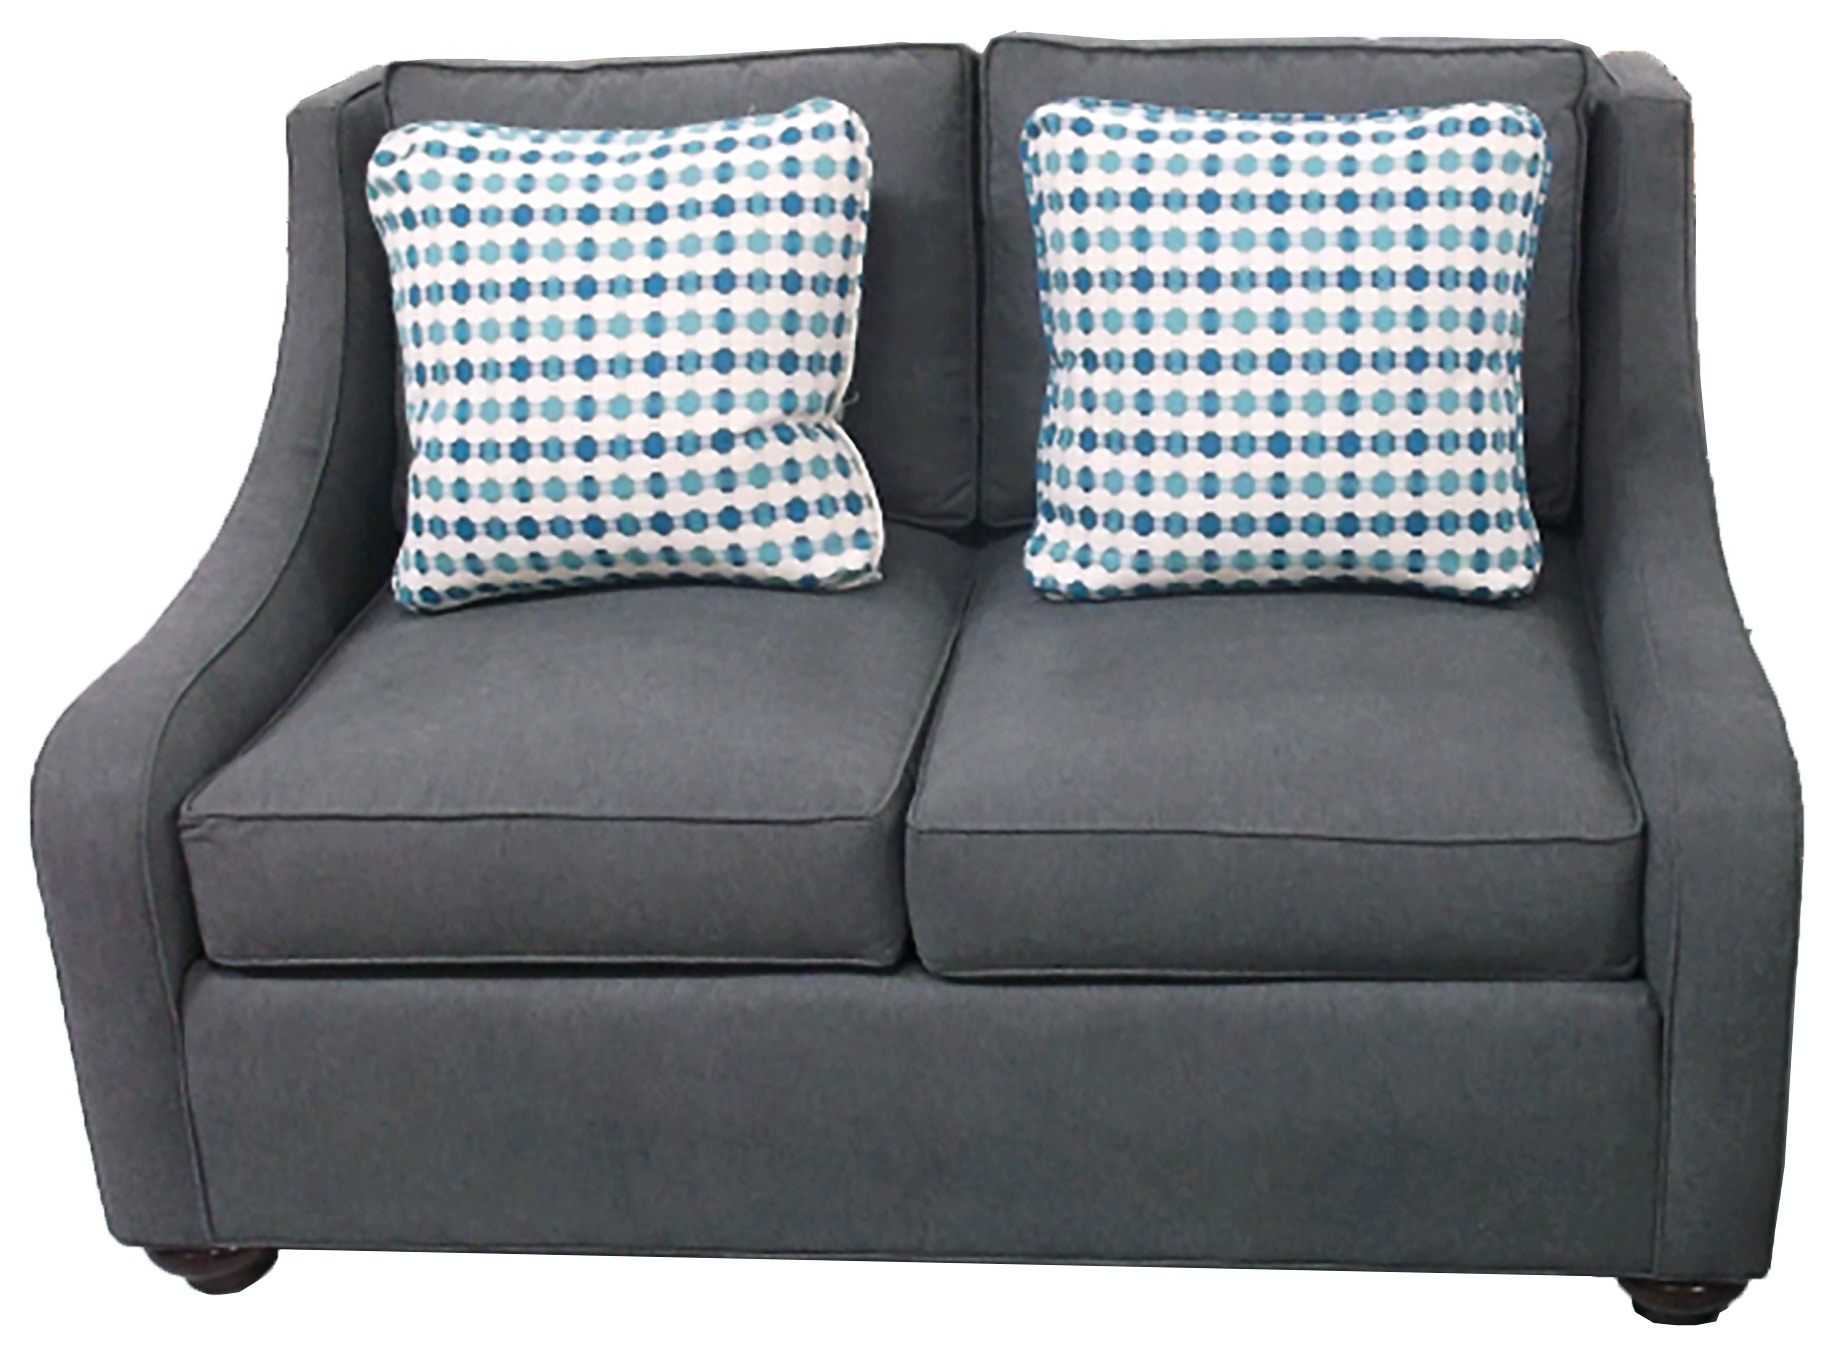 Vanguard Furniture American Bungalow Barkley Loveseat 641 LS